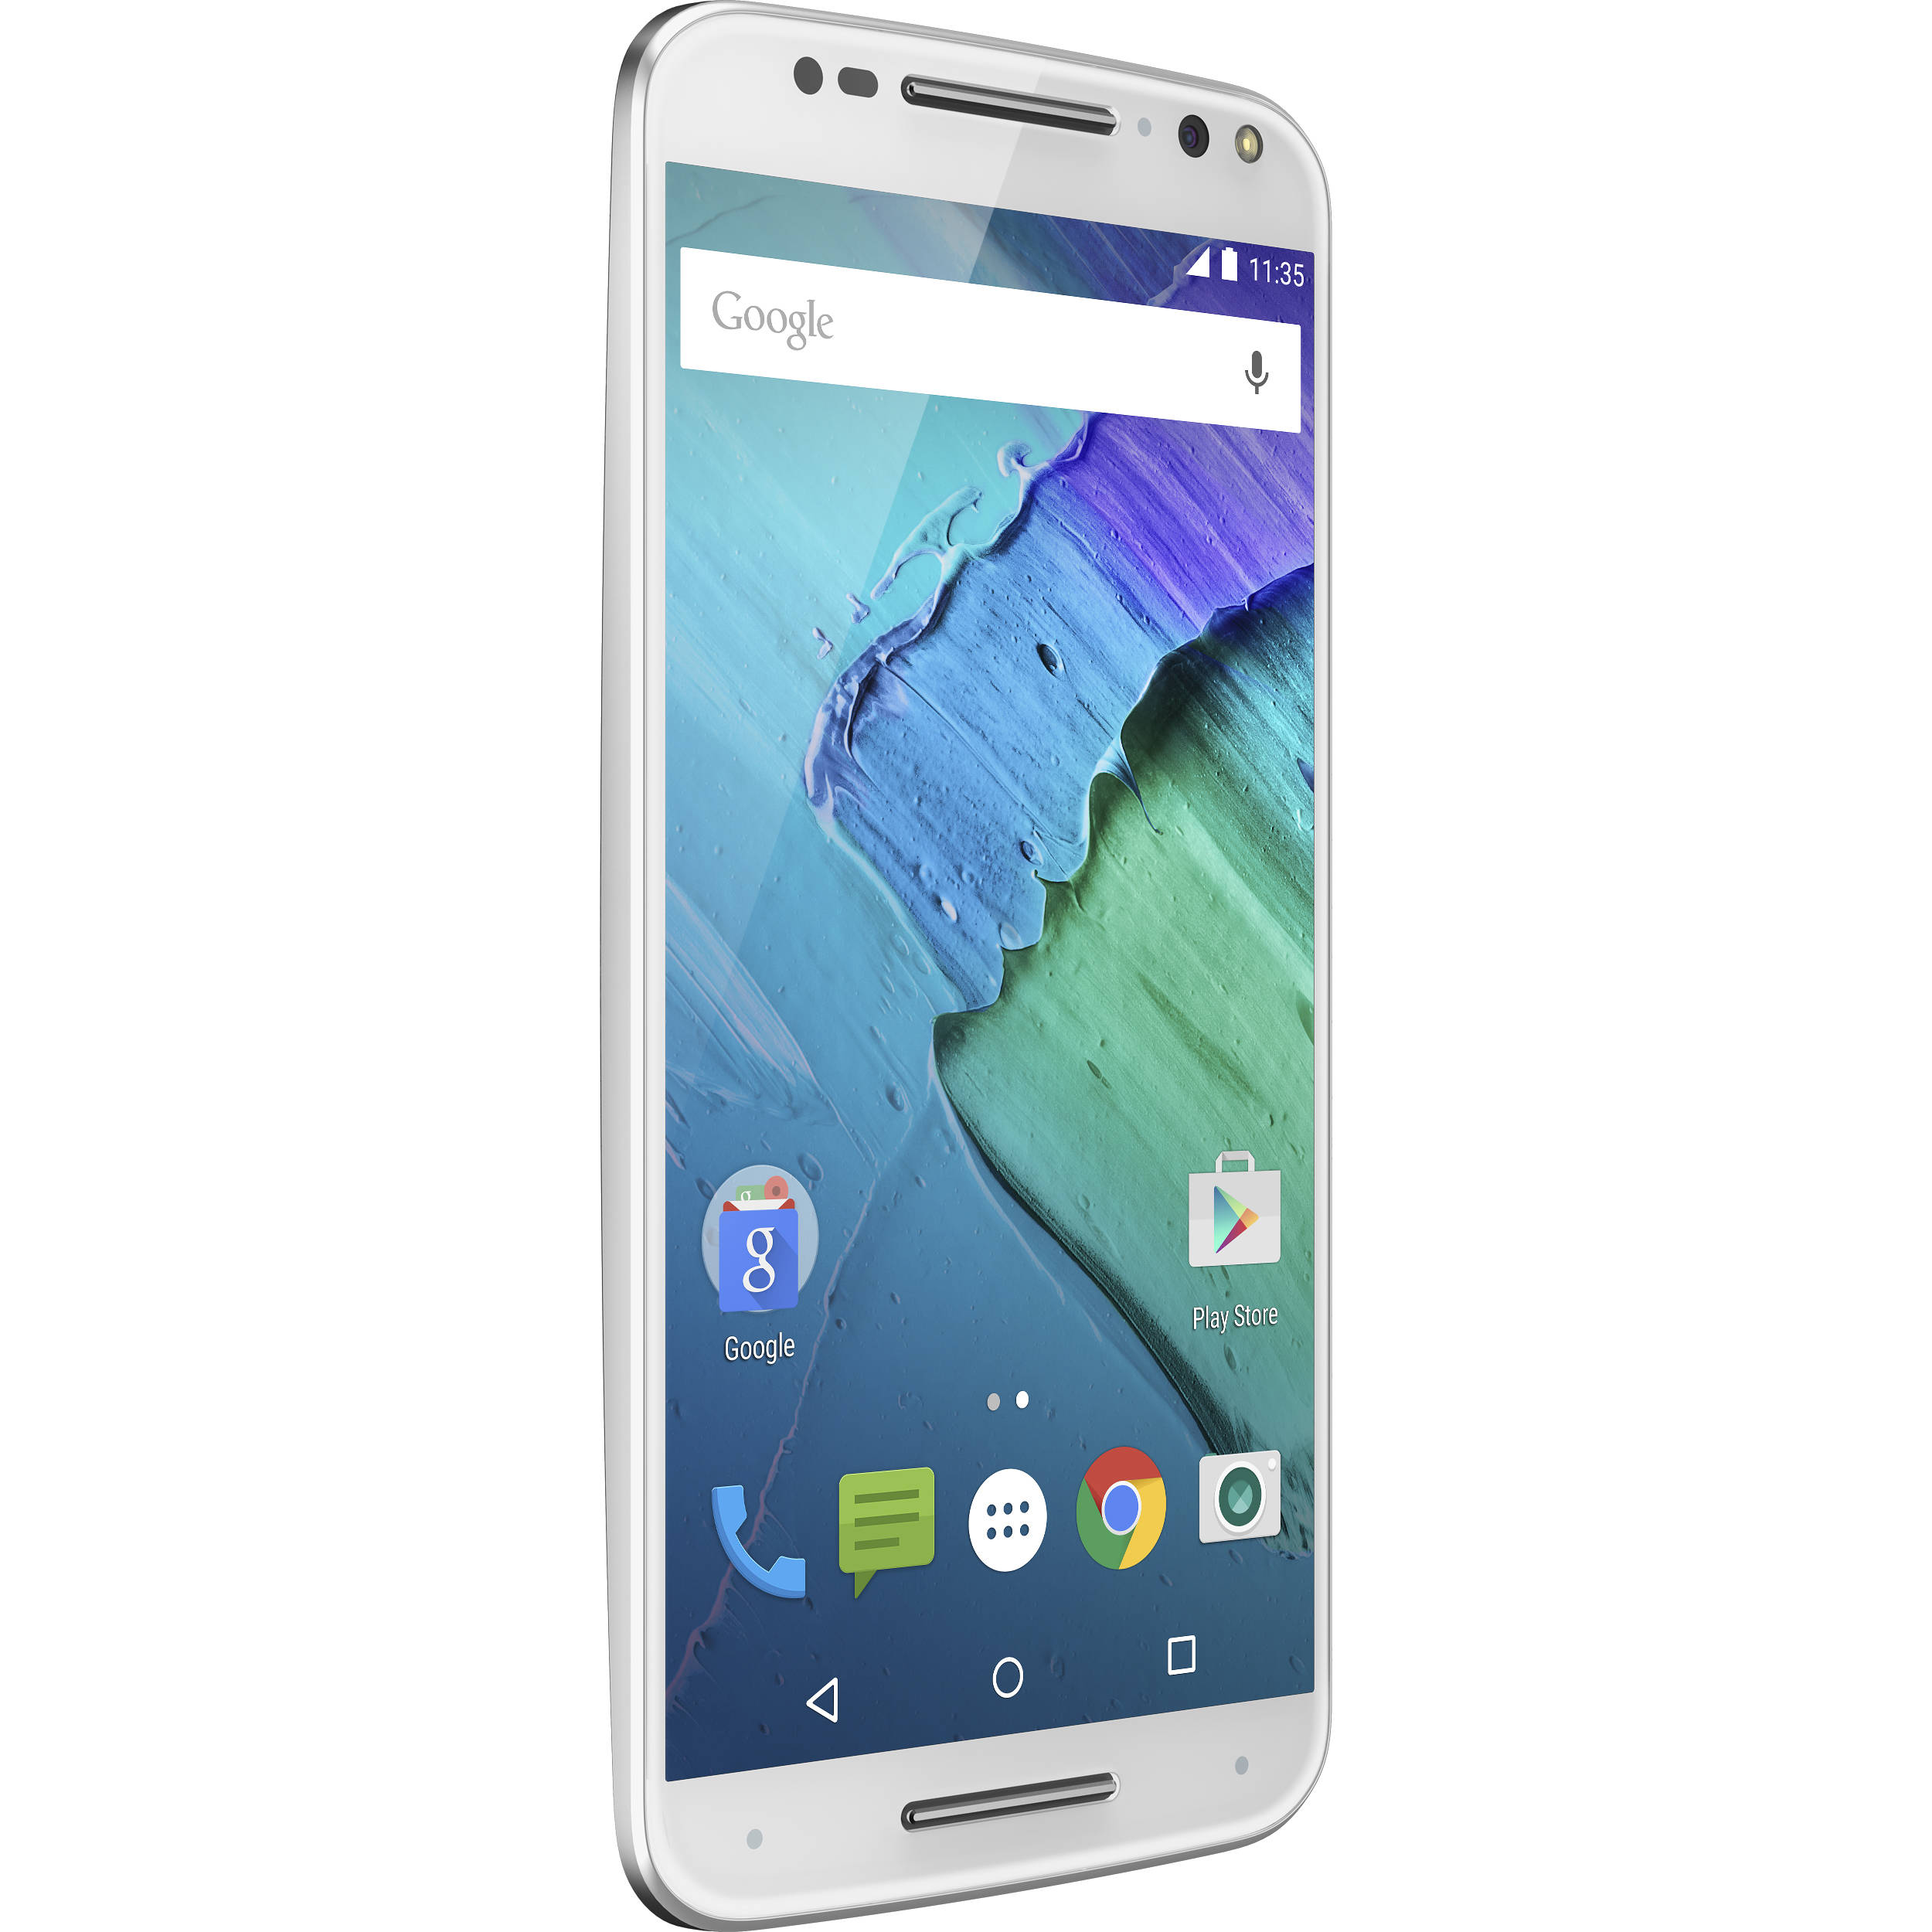 Moto Moto X Pure Edition 16GB Smartphone 00922NARTL B&H Photo